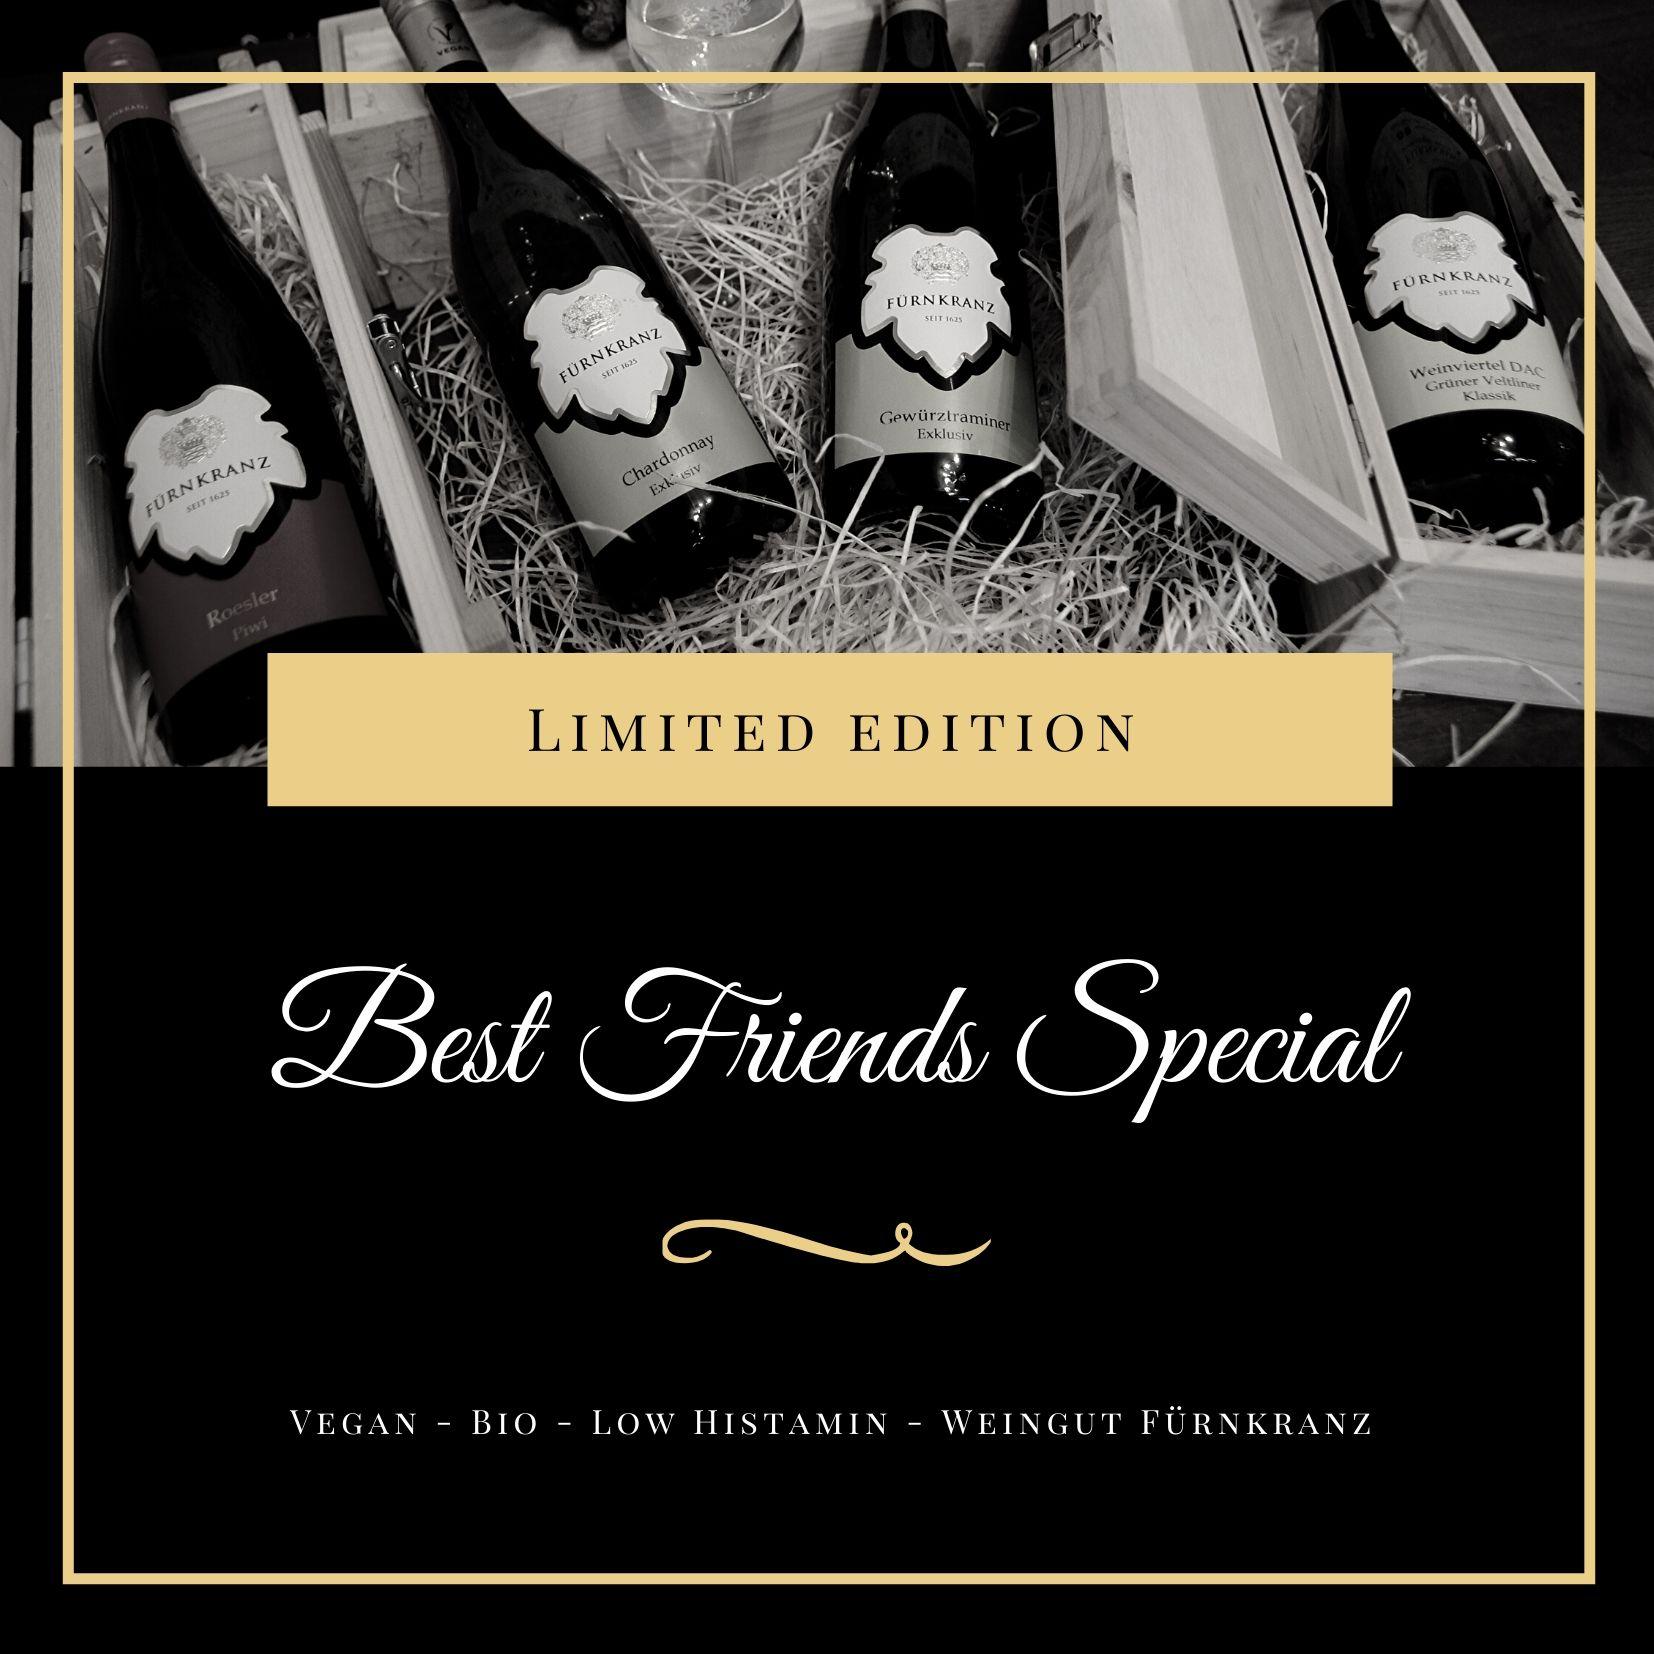 Best Friends Special